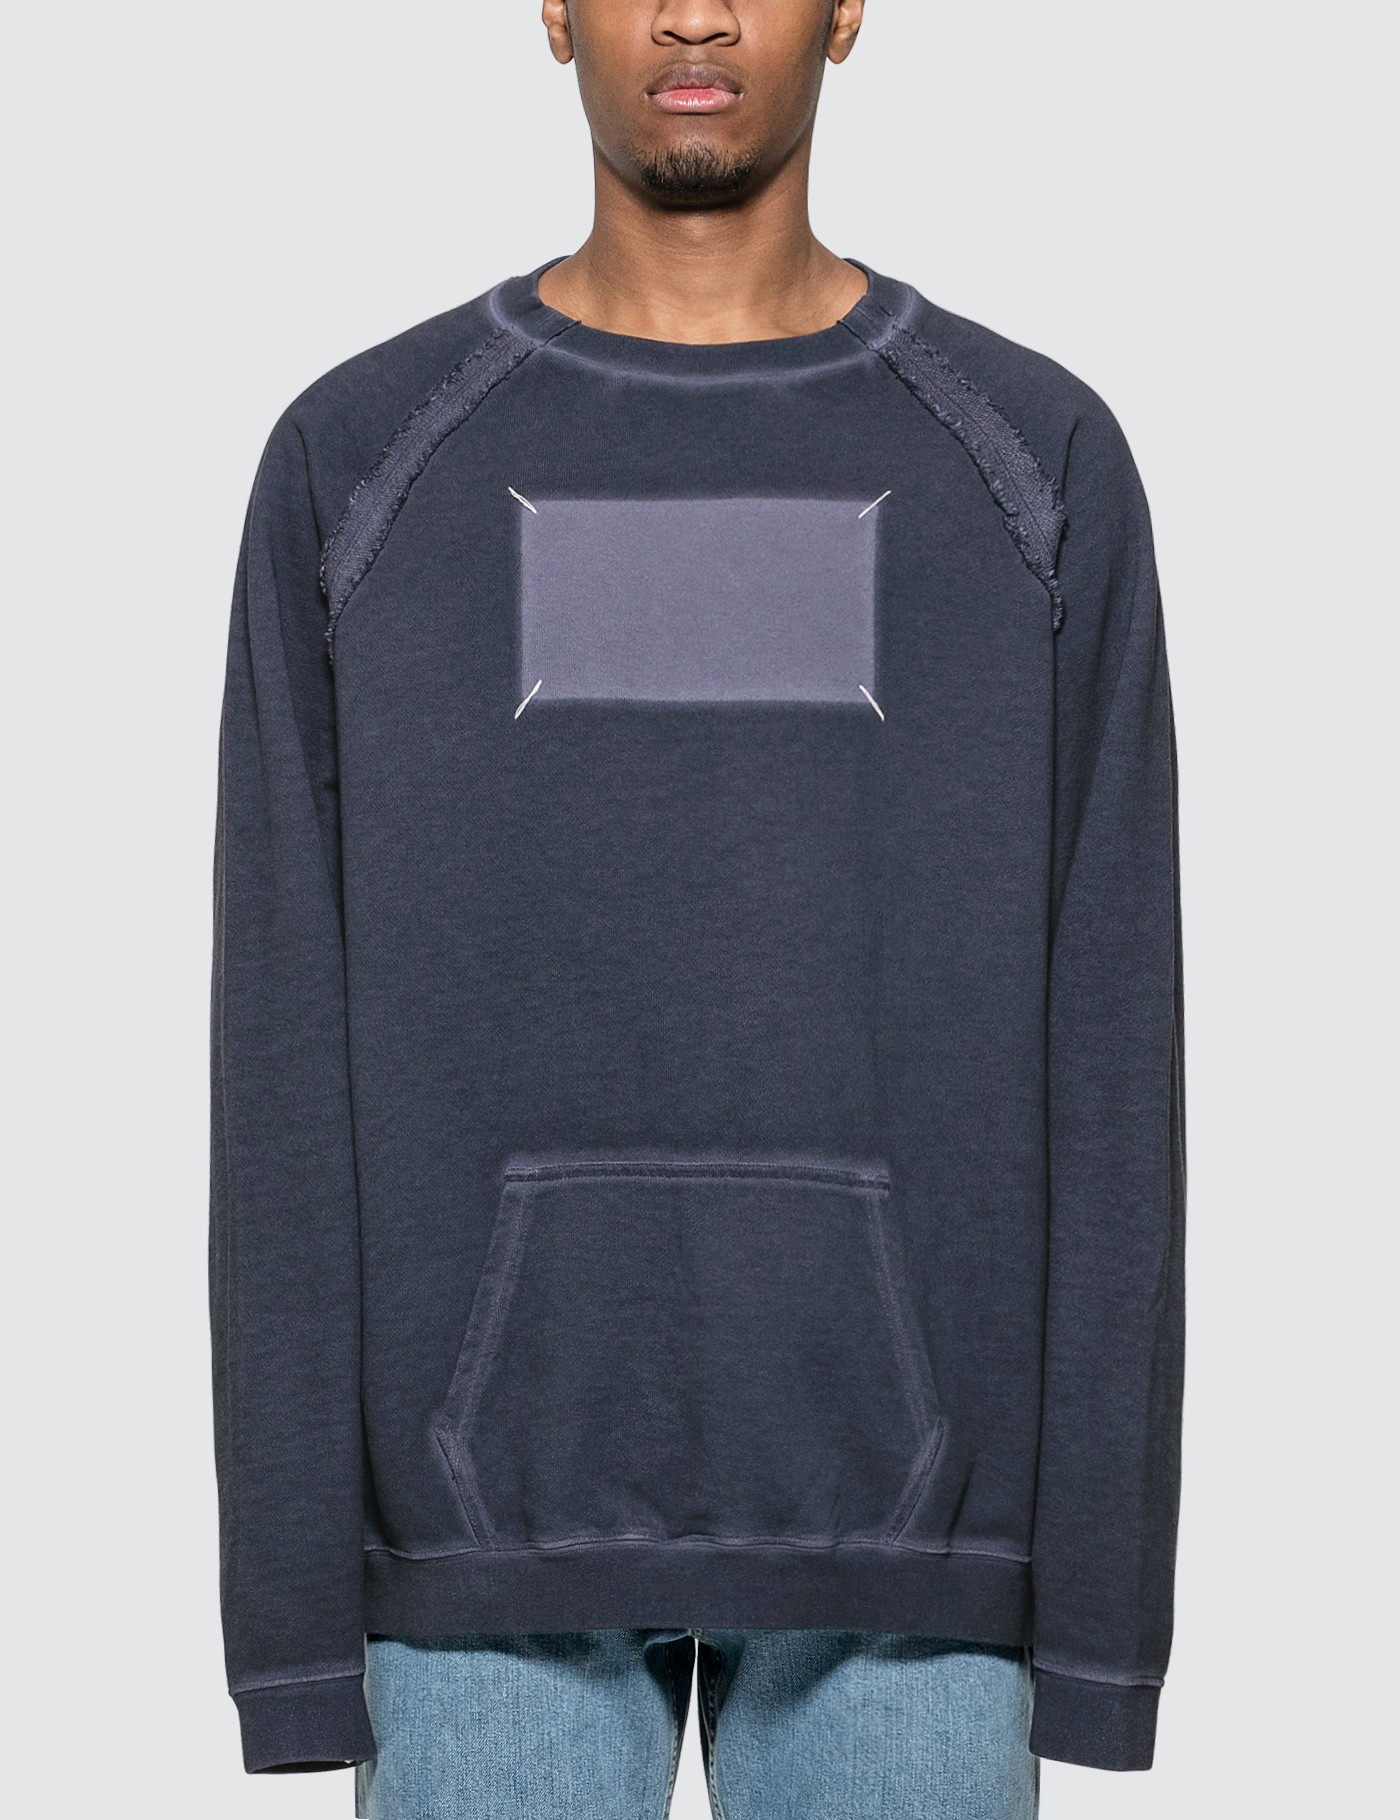 Memory of Label Sweatshirt